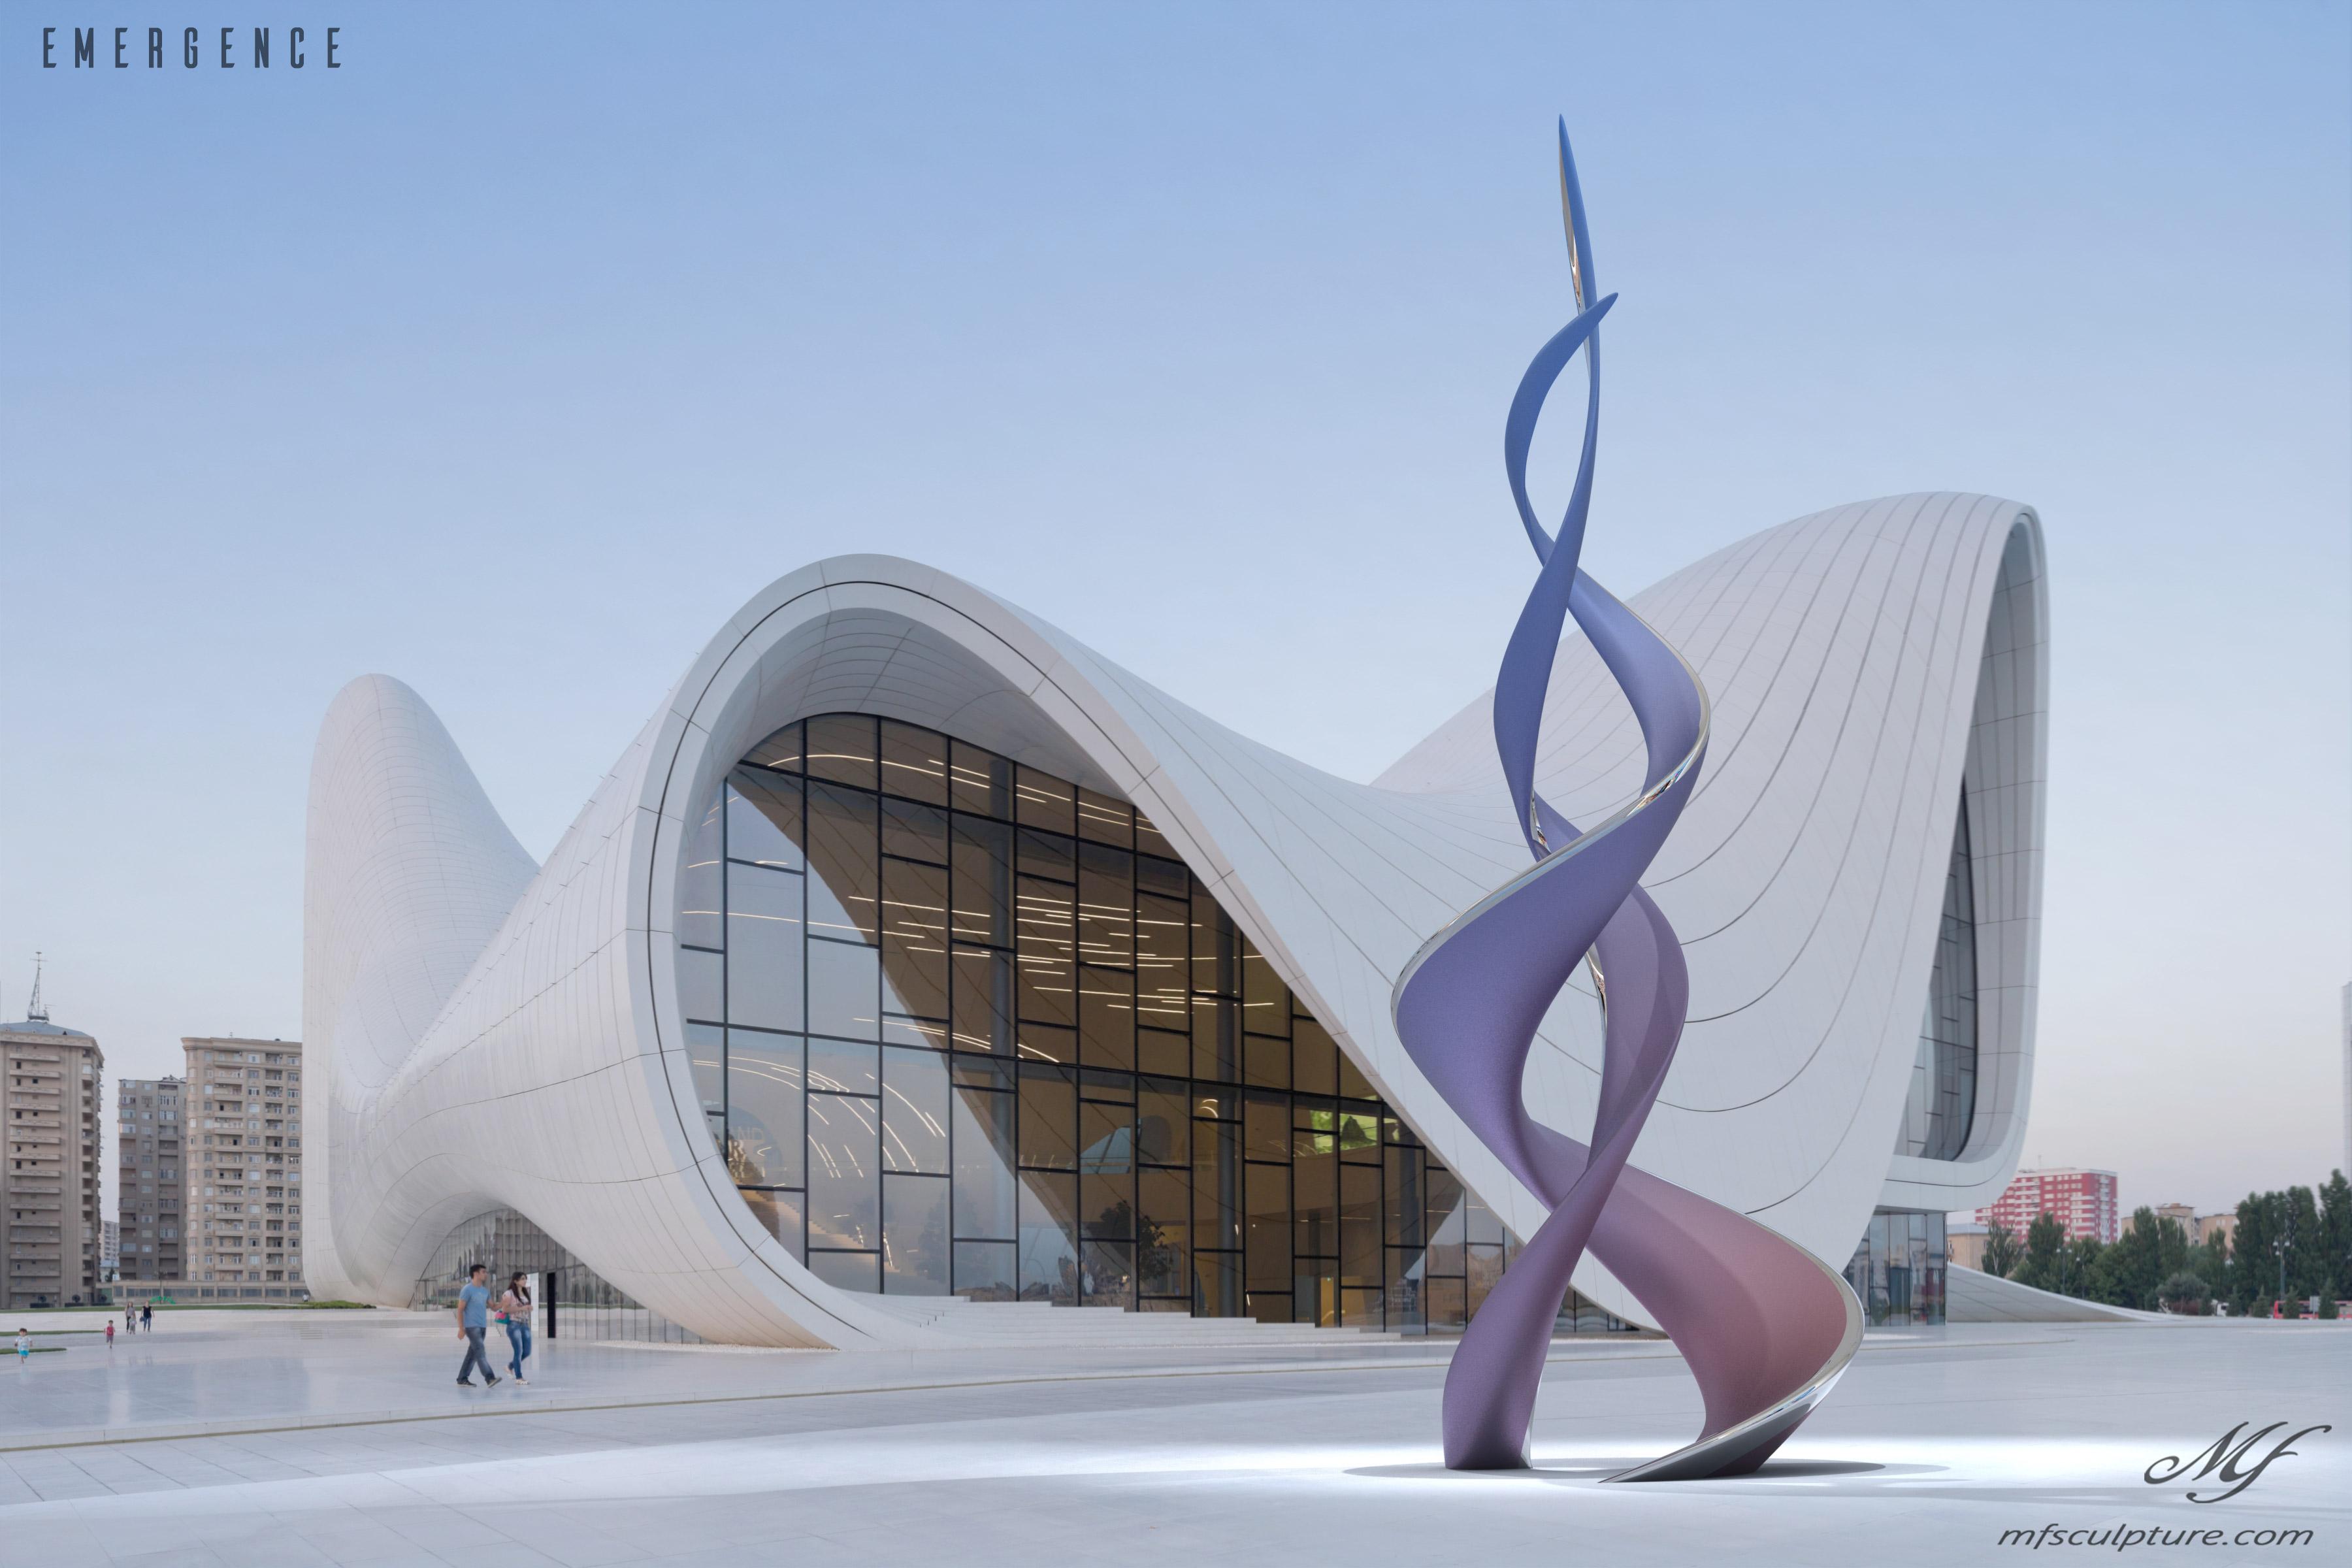 Heydar aliyev center baku zaha hadid Unity Modern Sculpture Emergence Monument 2